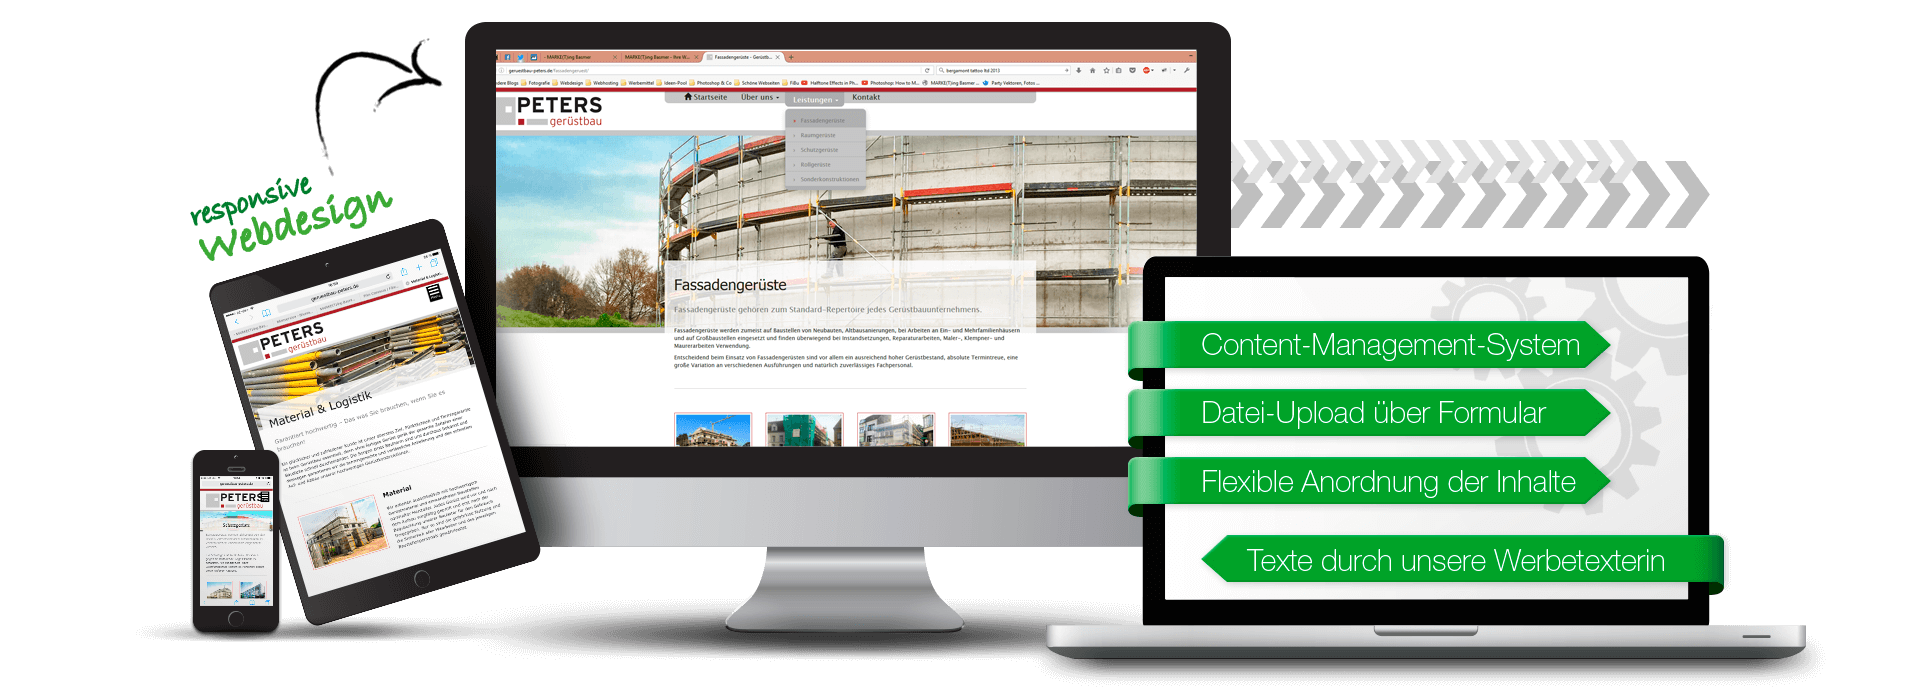 Titelbild-Webdesign-Content-Management-System-Geruestbau-Peters-kleve